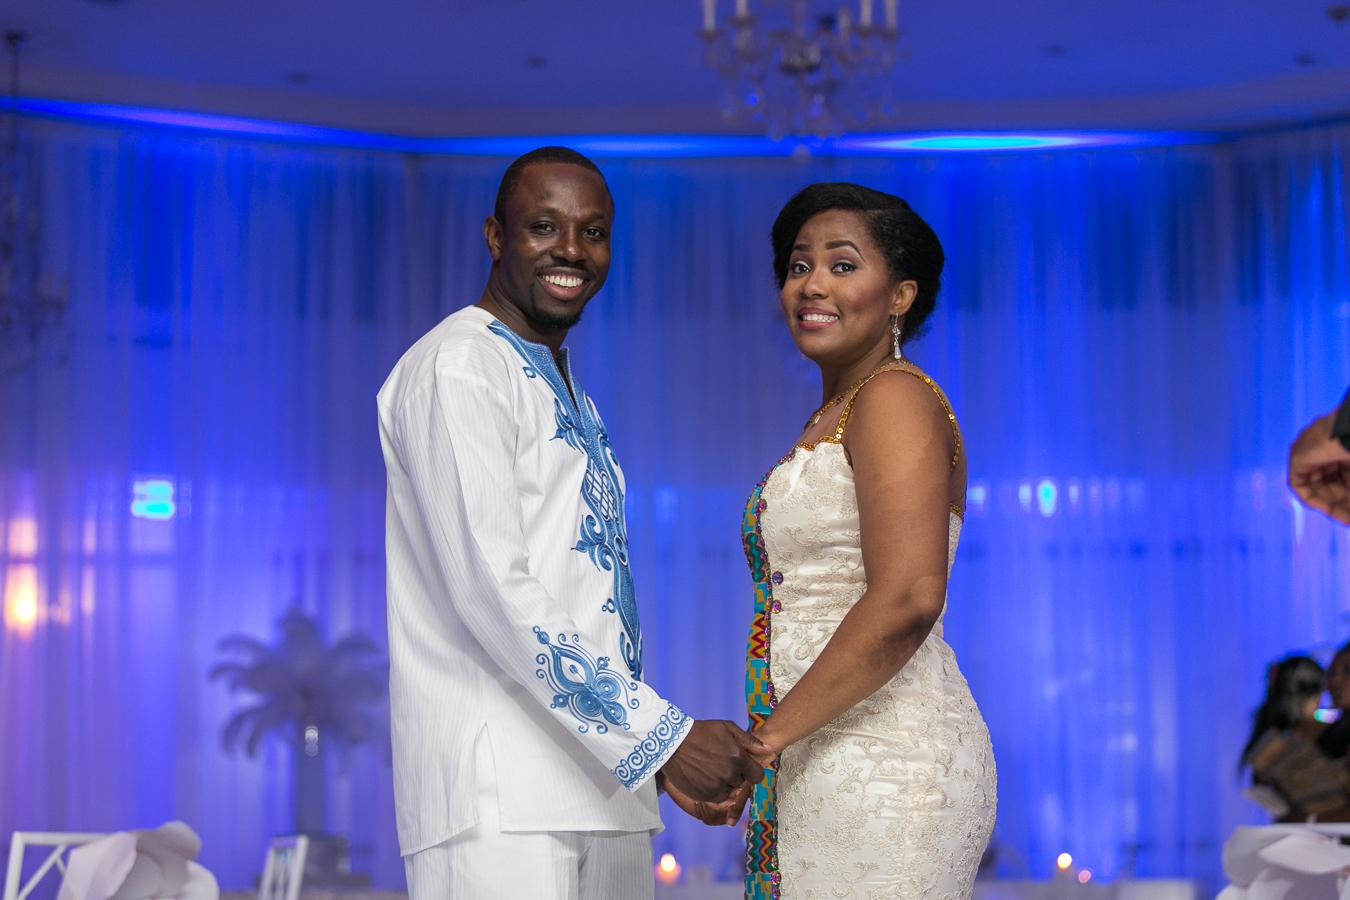 Jamaica to Ghana Wedding - Shelly and Sigli